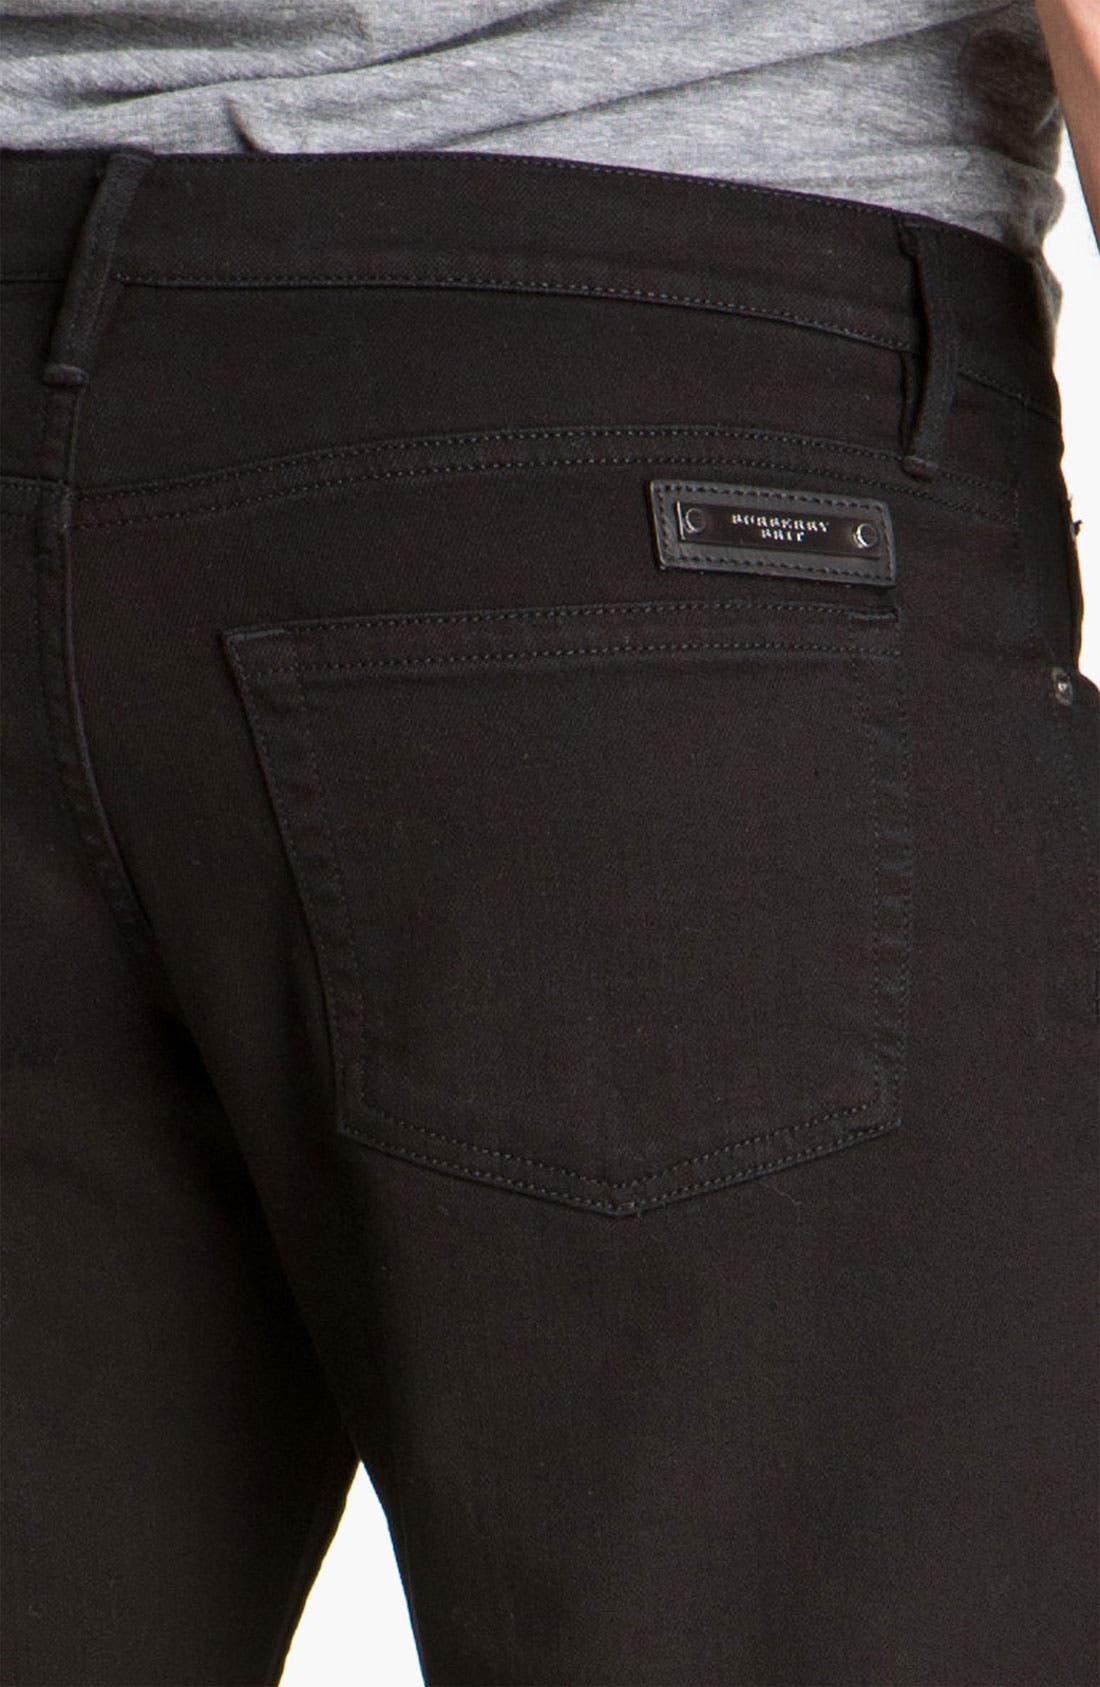 Alternate Image 4  - Burberry Brit Stretch Denim Jeans (Clean Black)